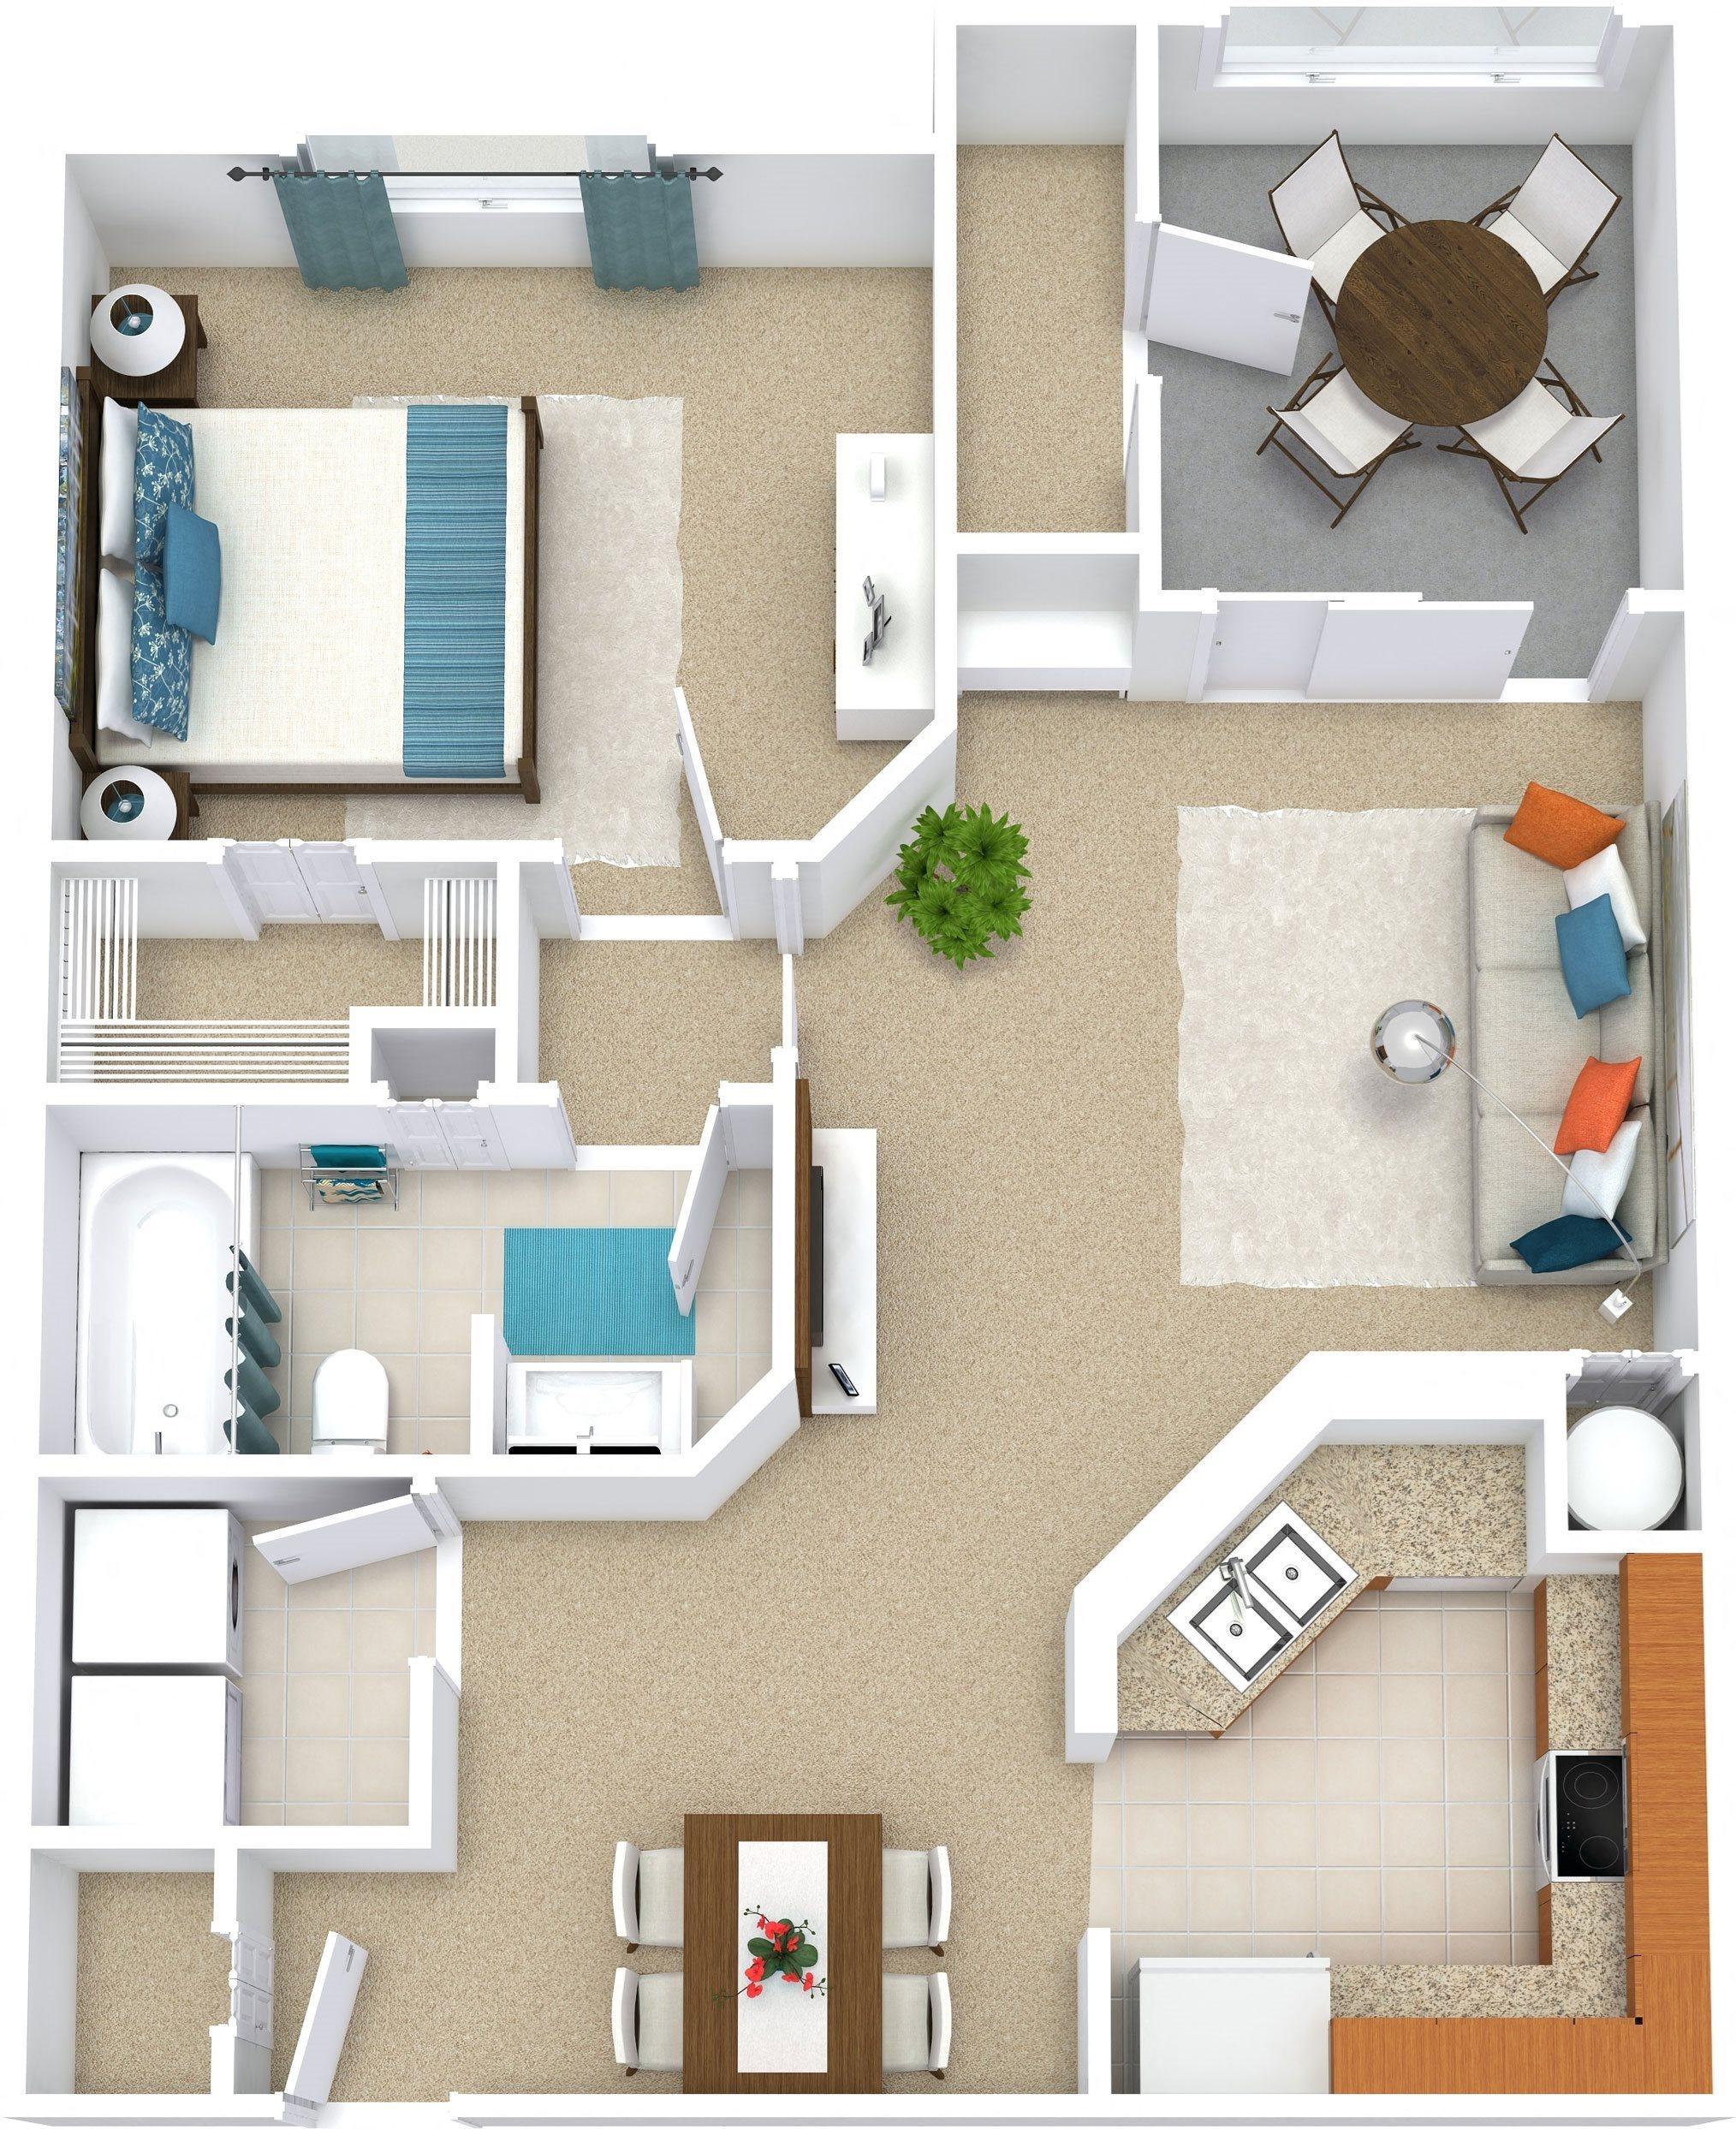 La Paloma Apartments: Floor Plans Of Mission Club Apartments In Orlando, FL